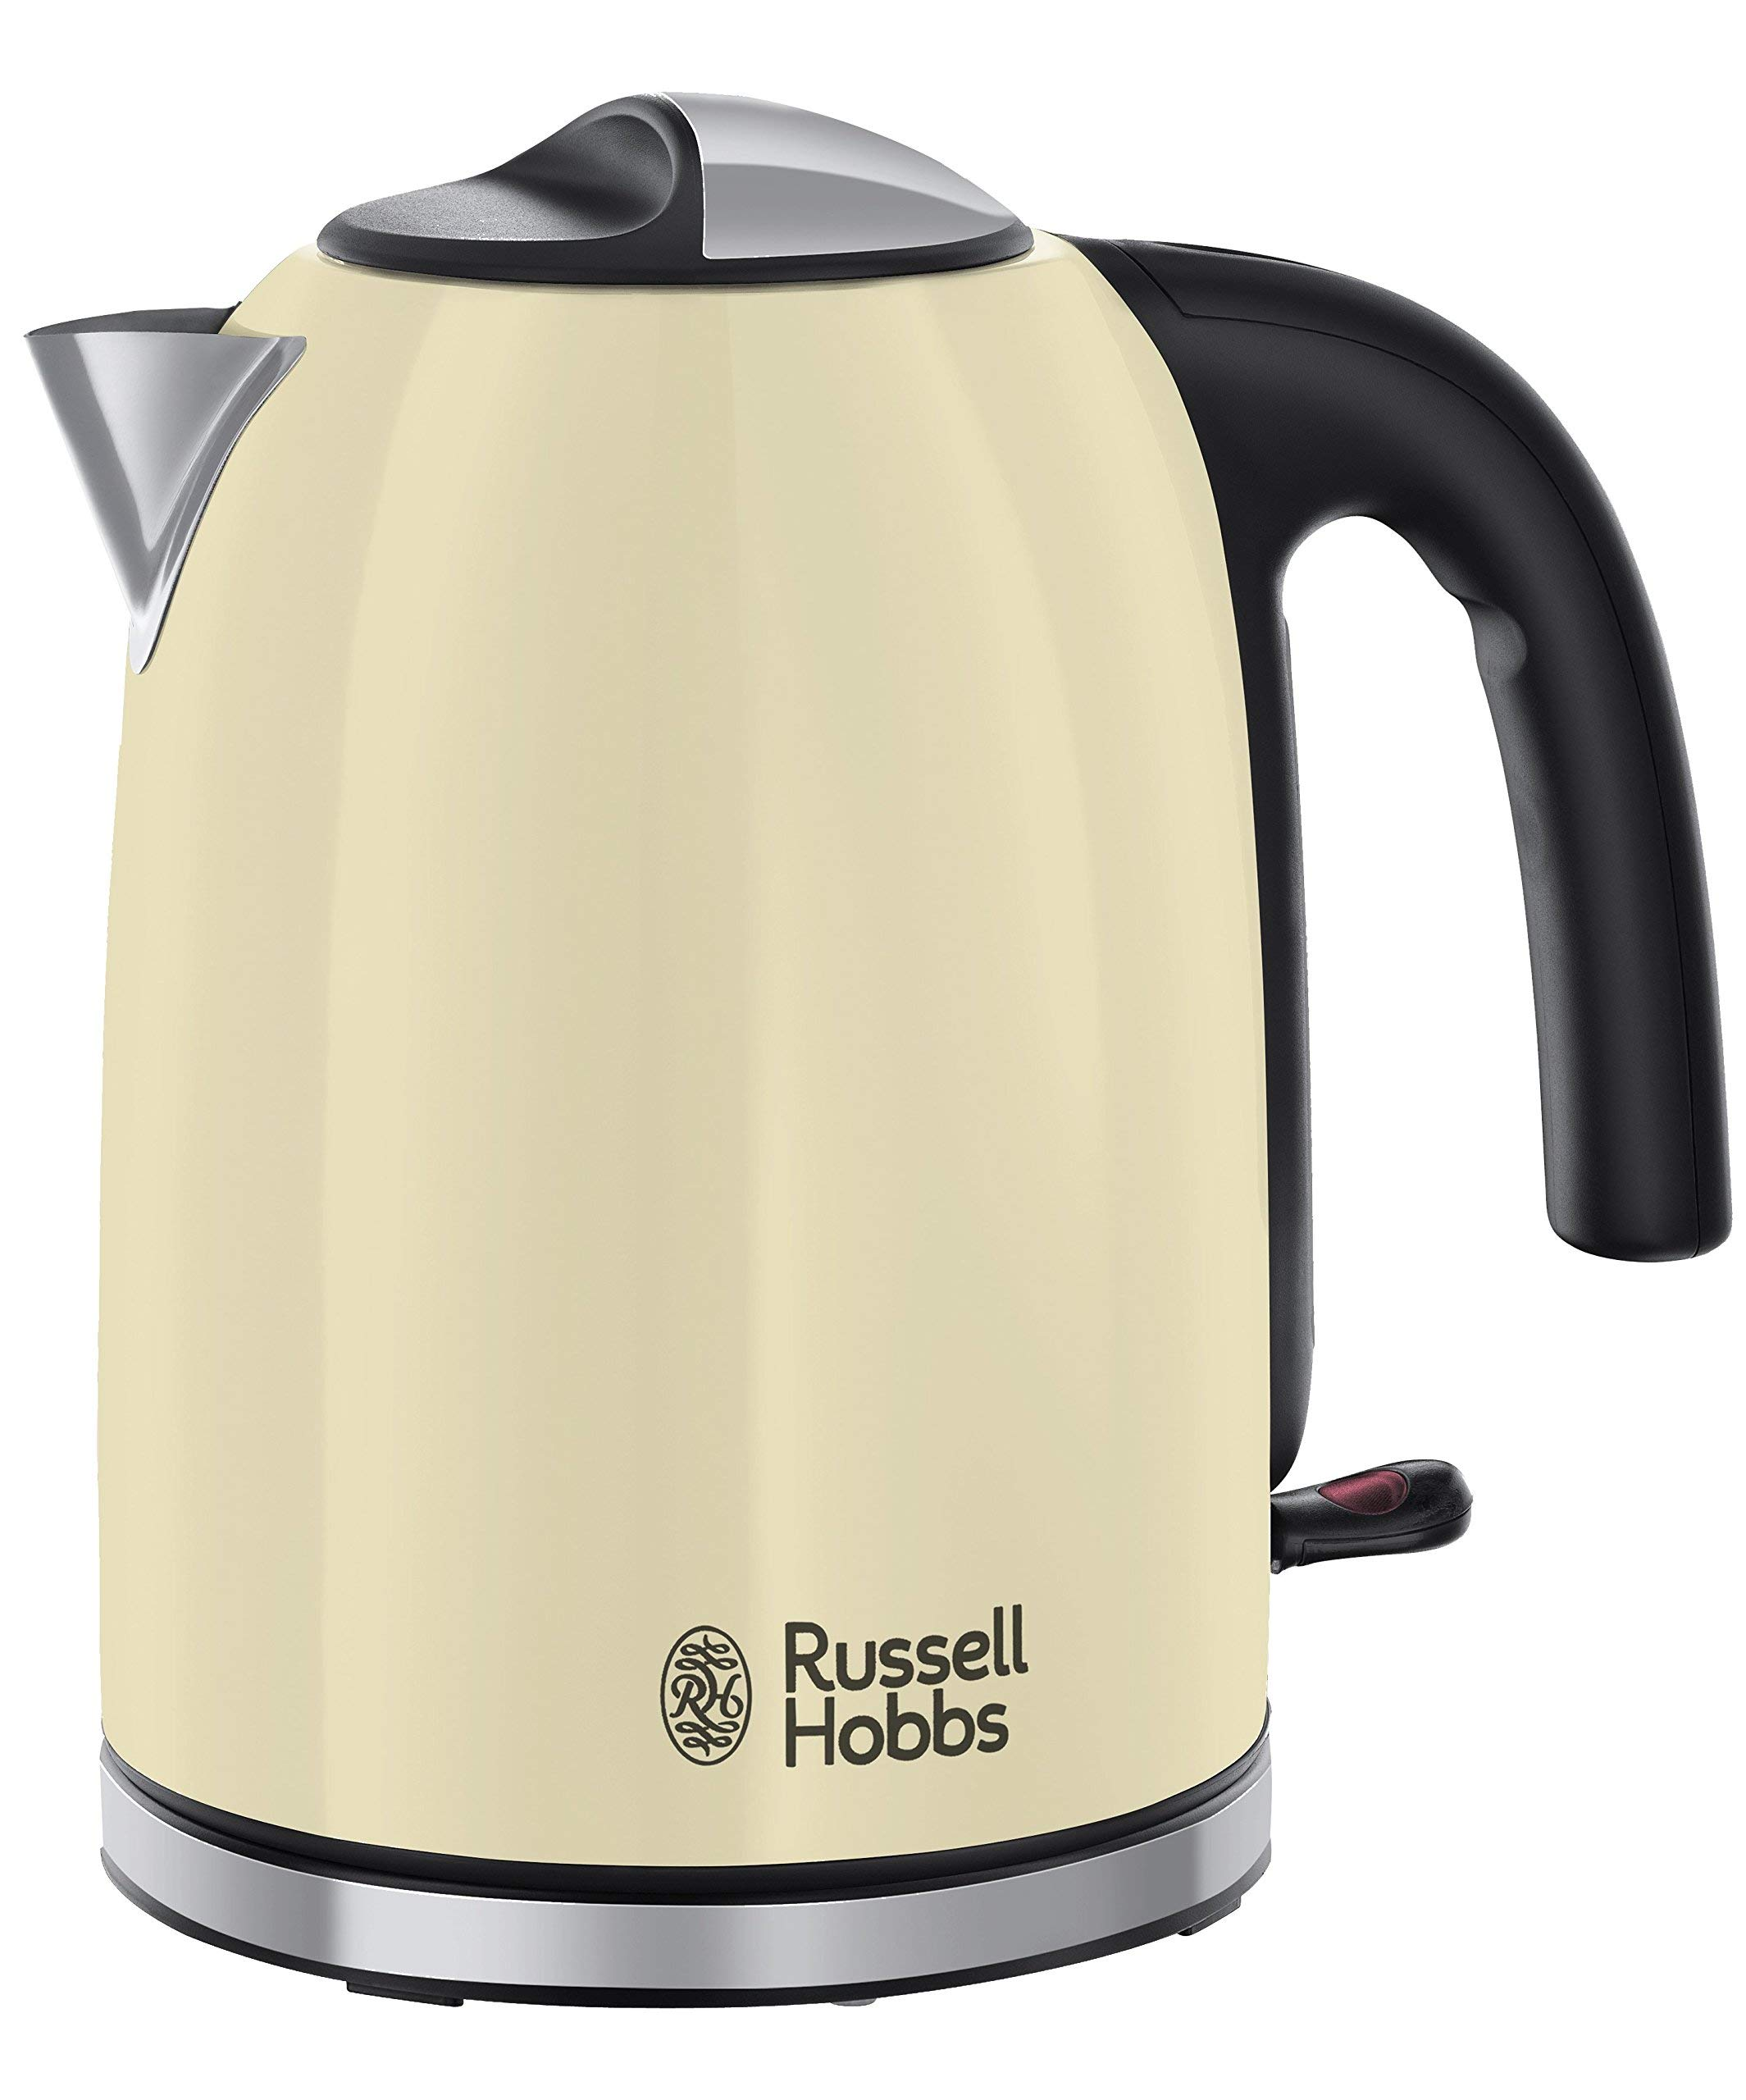 Russell Hobbs Colours Plus - Hervidor de Agua Eléctrico (2400 W, 1,7 litros, Acero Inoxidable, Crema) - ref. 20415-70: Amazon.es: Hogar